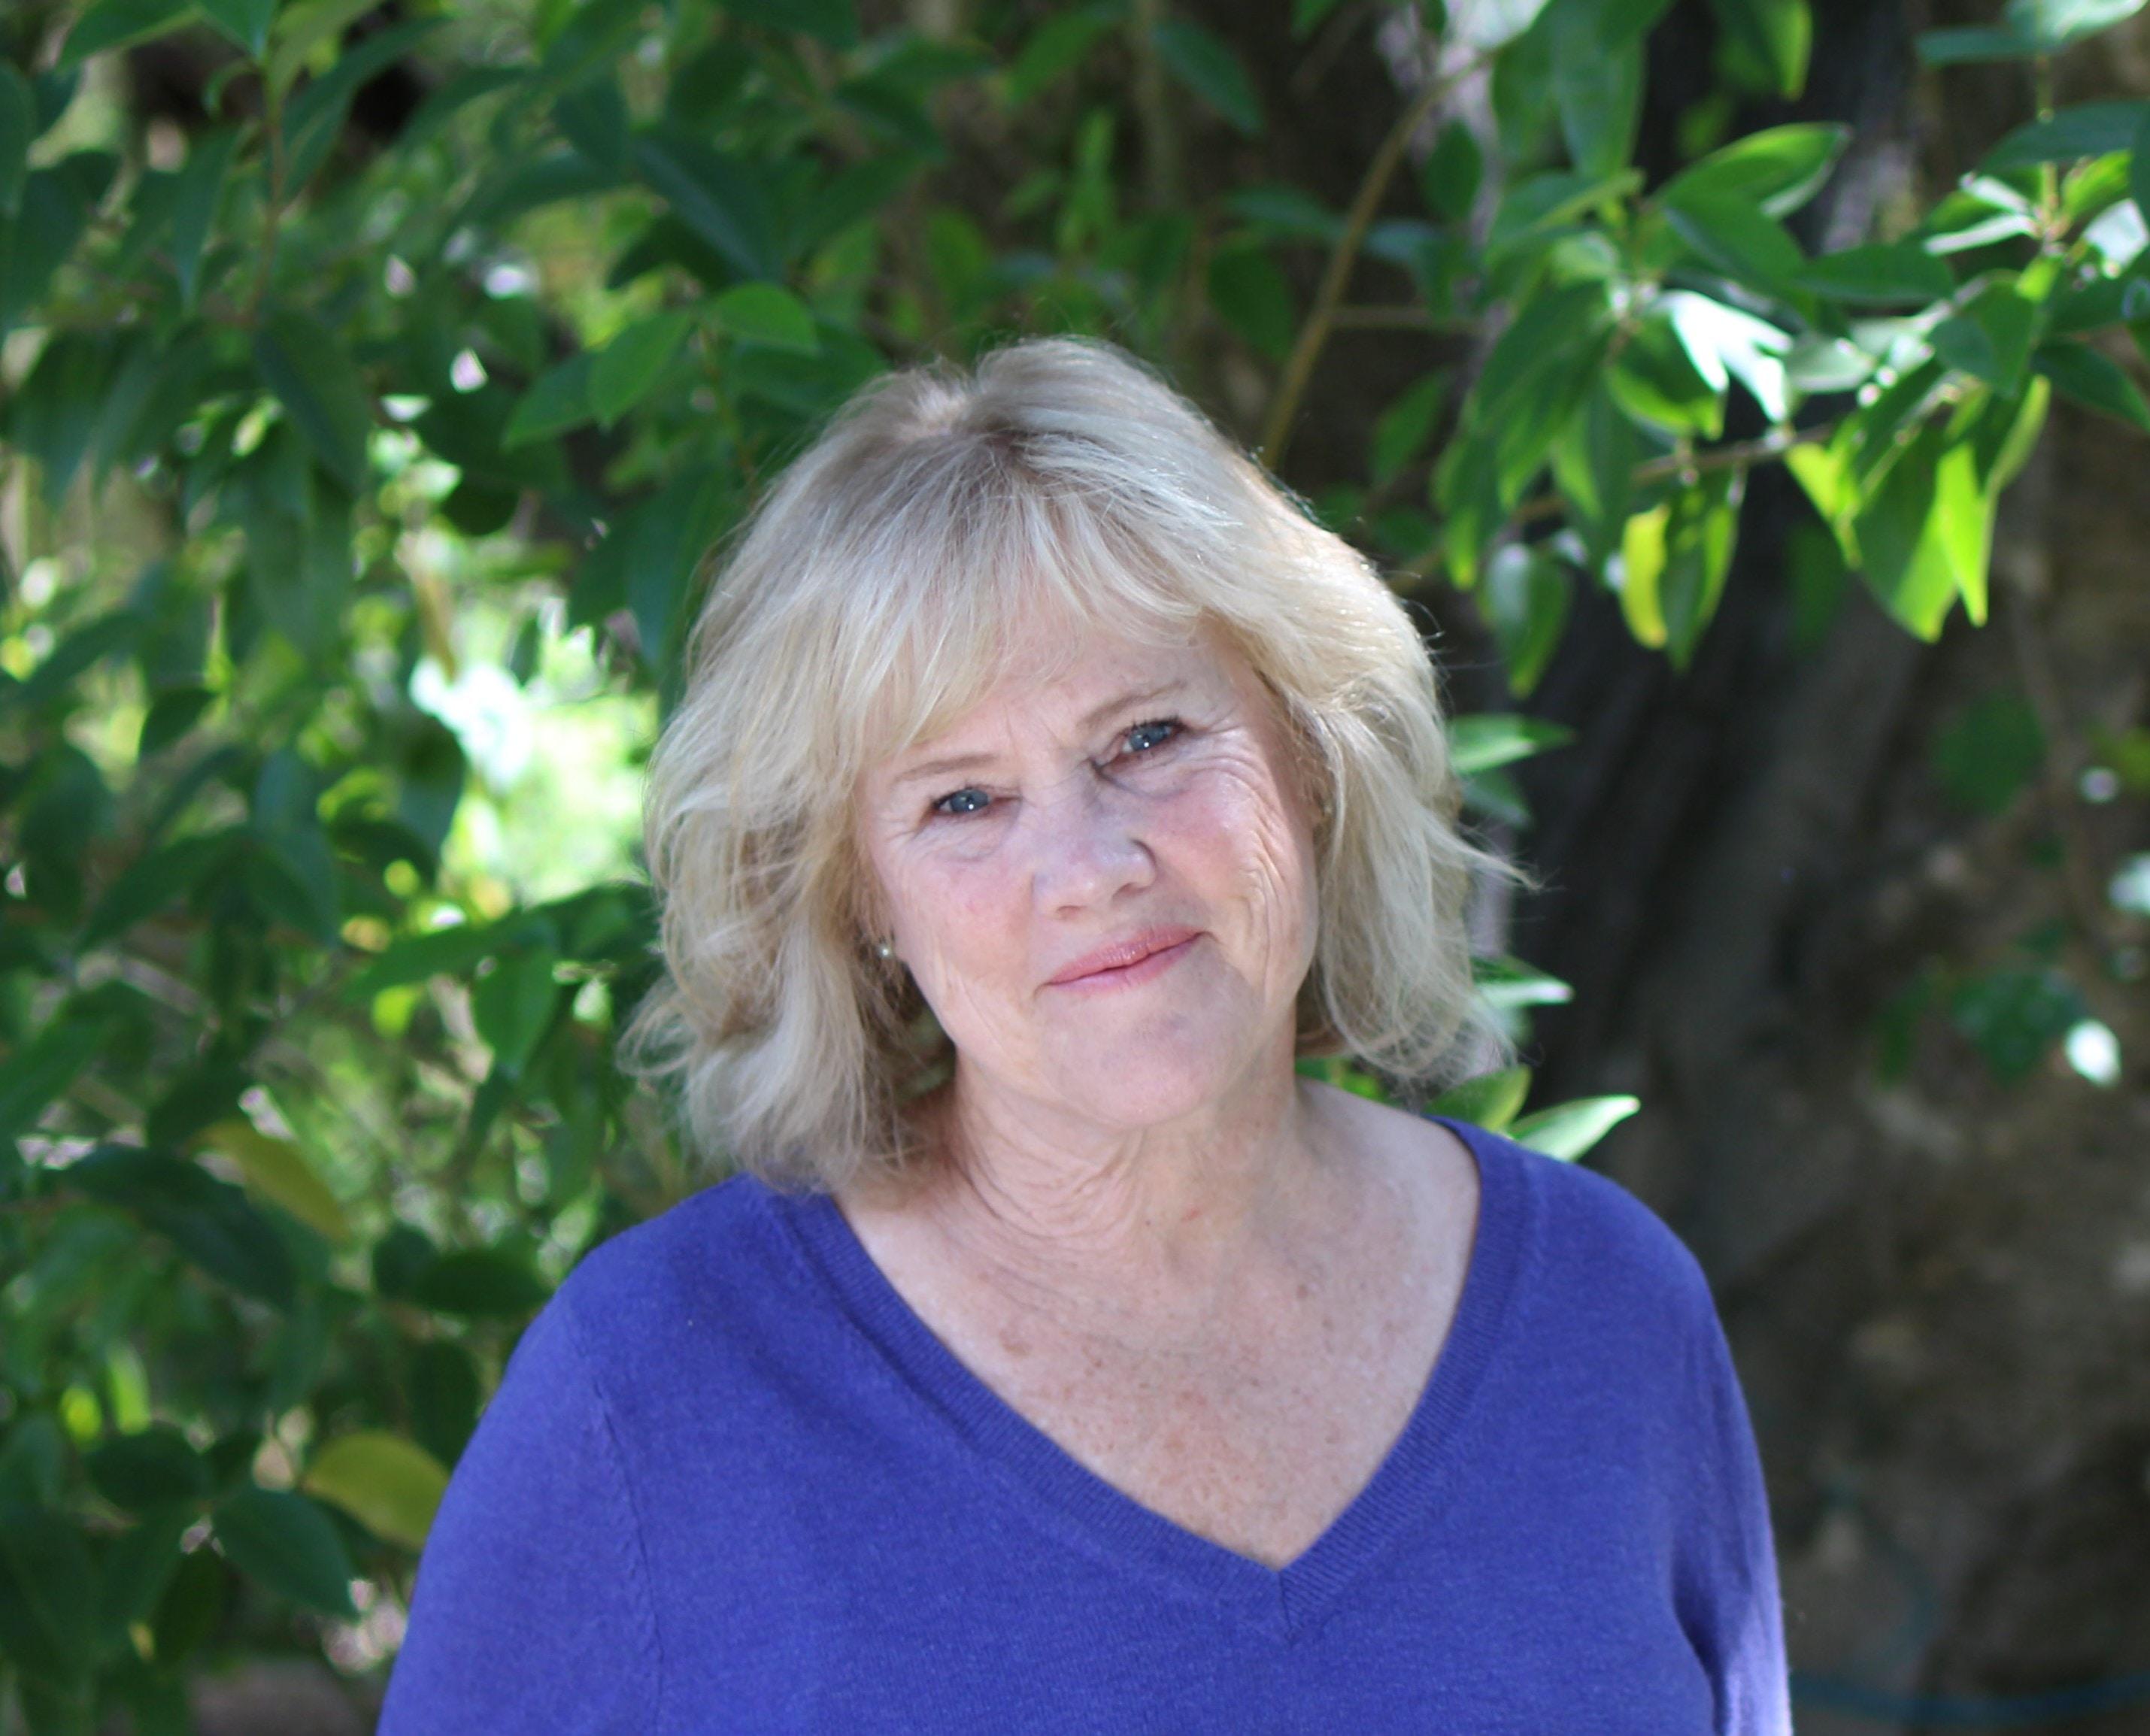 Go to Patty James's profile